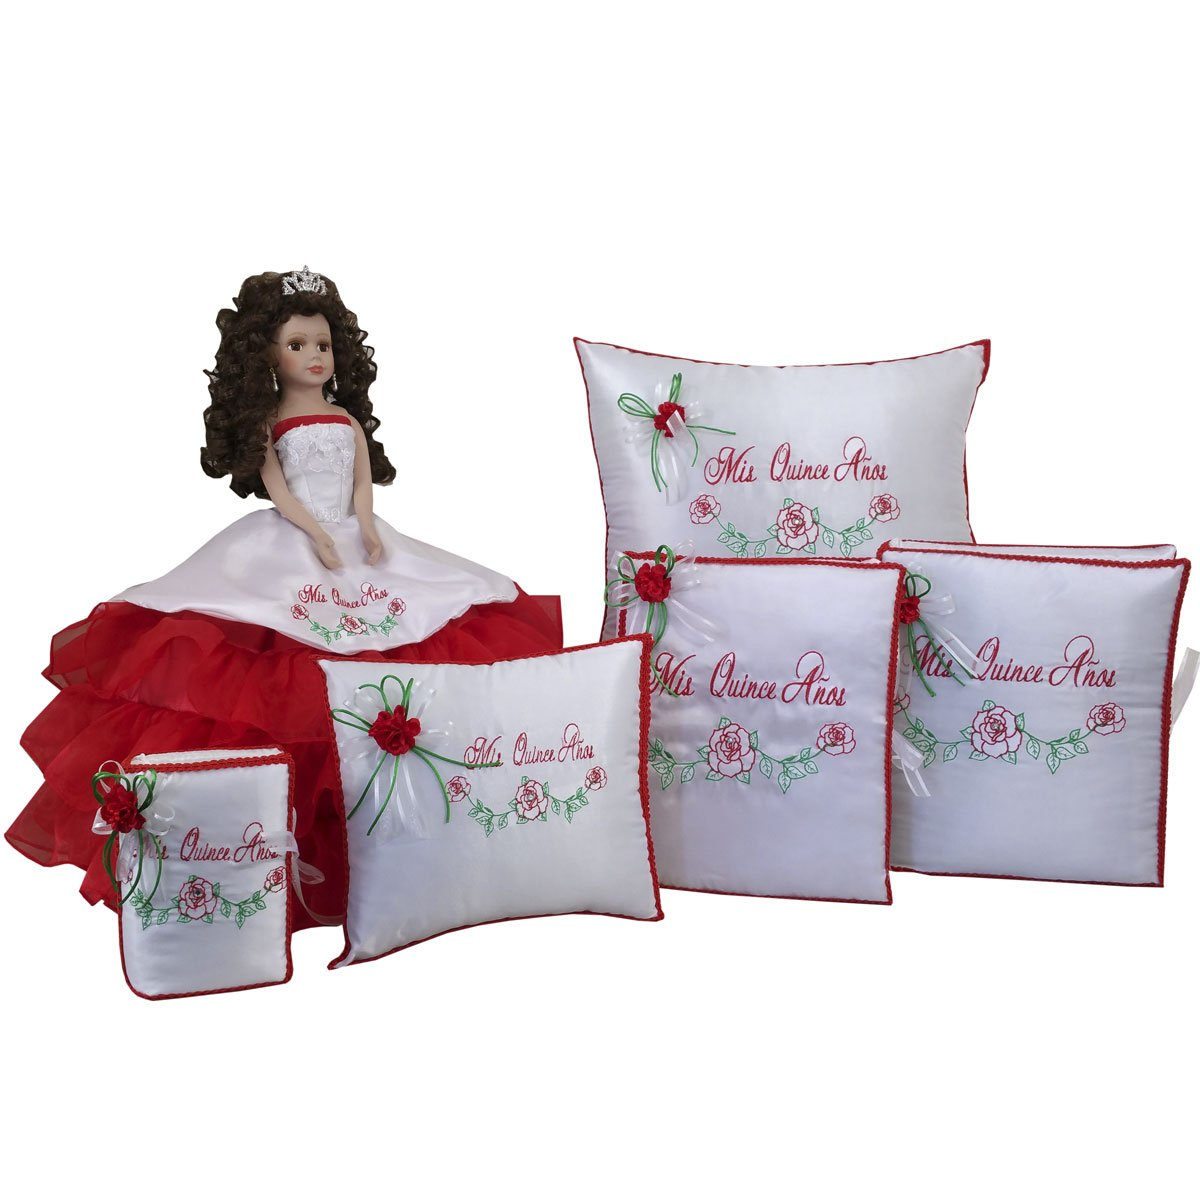 Quinceanera Doll Set with Guest Book Kneeling Tiara Pillow Photo Album Bible Q1060 (Basic set + English bible)